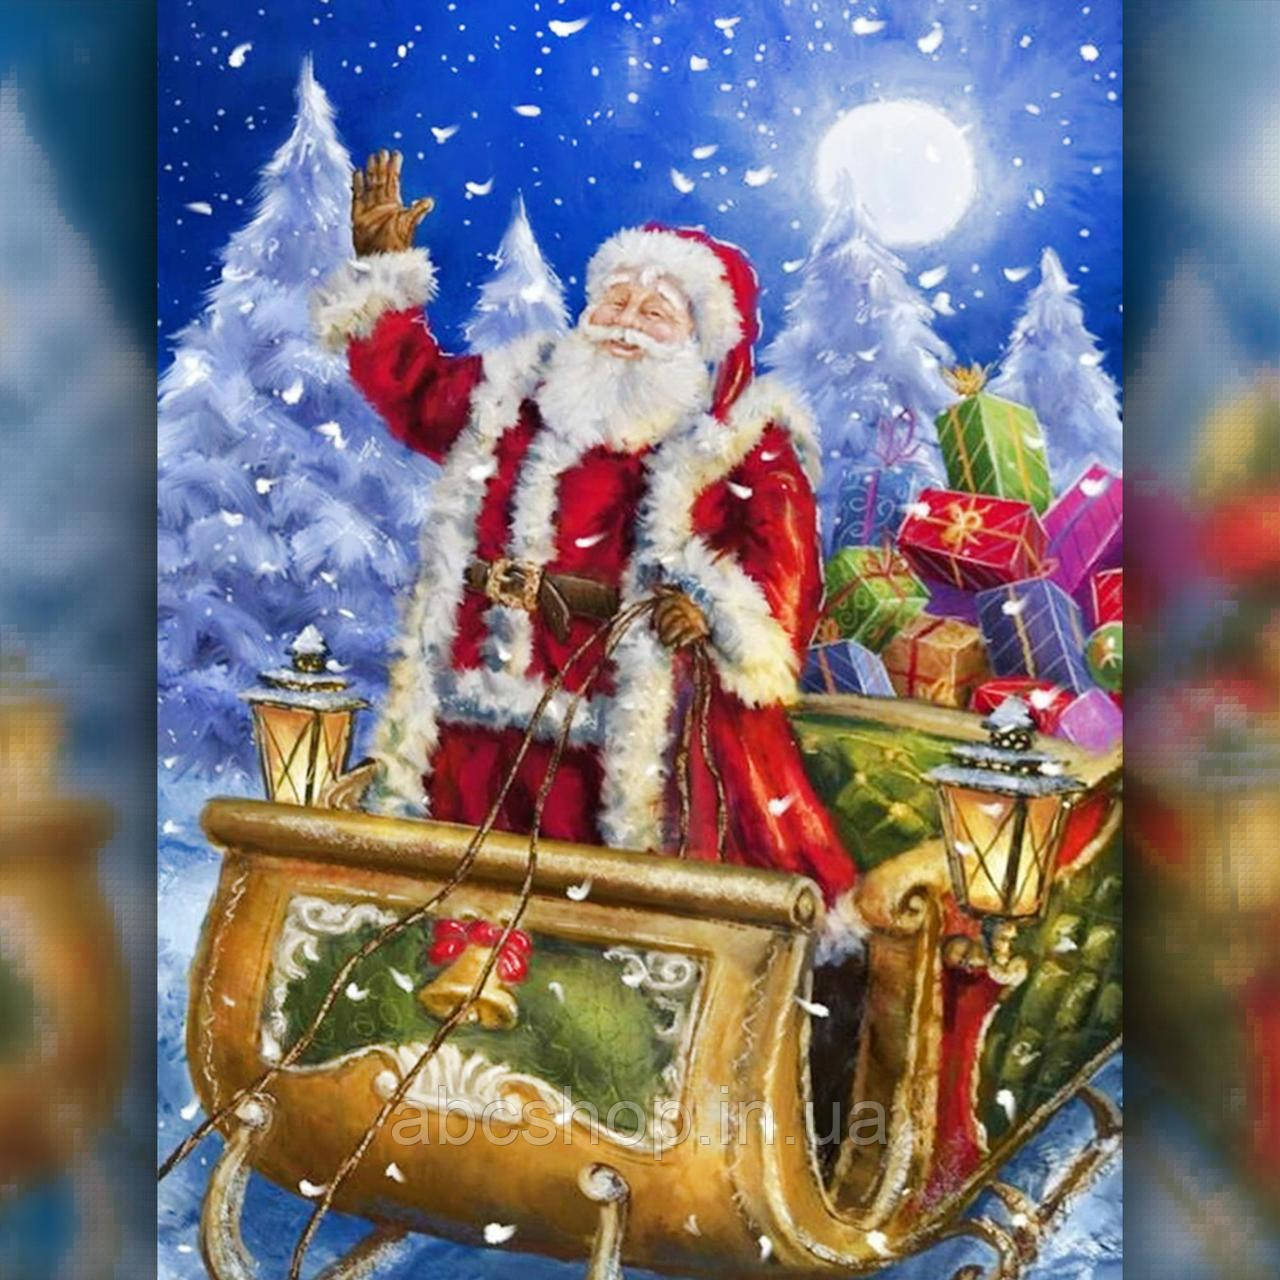 Алмазная вышивка Дед Мороз на санях 40х50 The Wortex Diamonds (TWD70004)